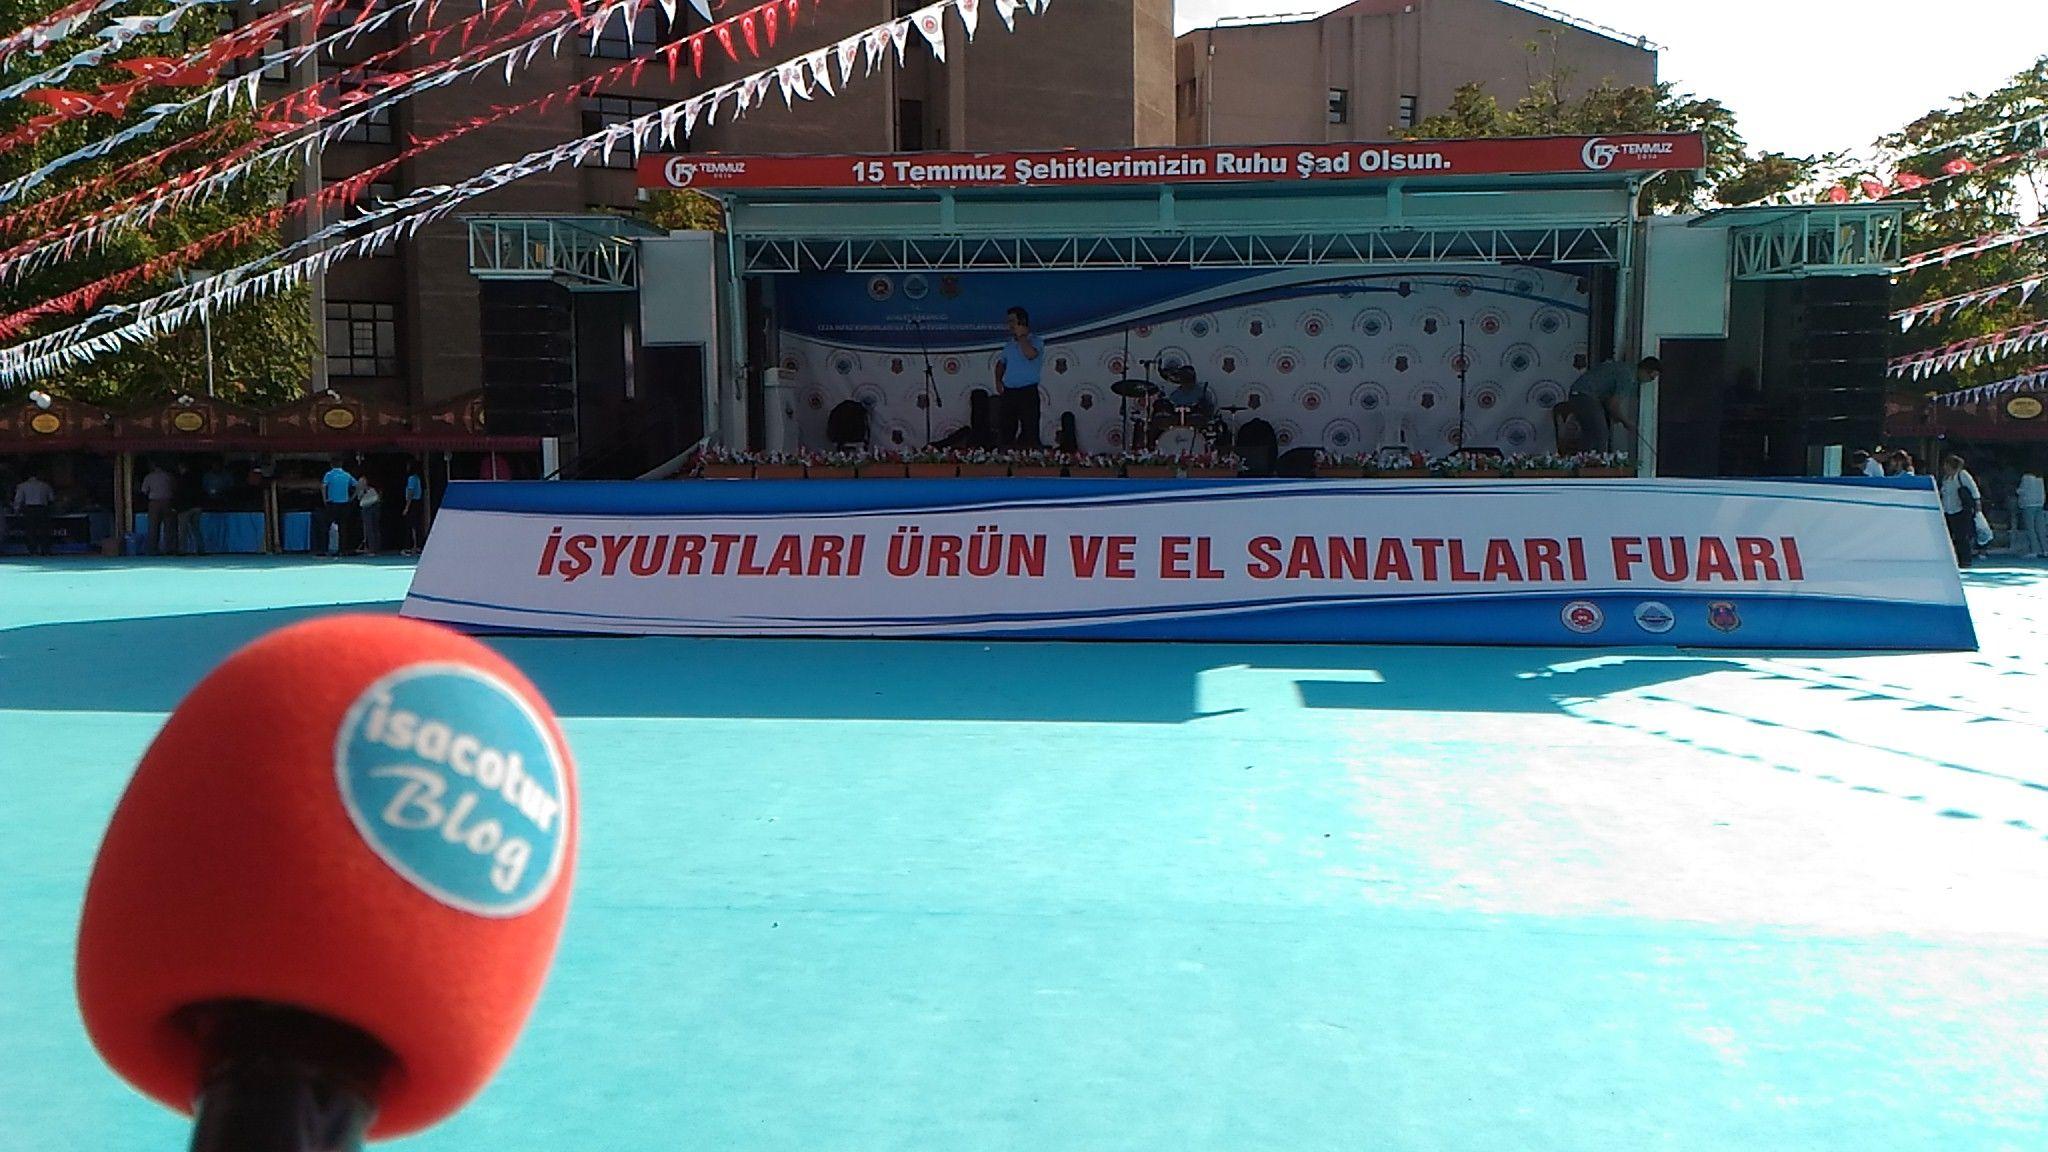 Ankara İş Yurtları Fuarı 2018